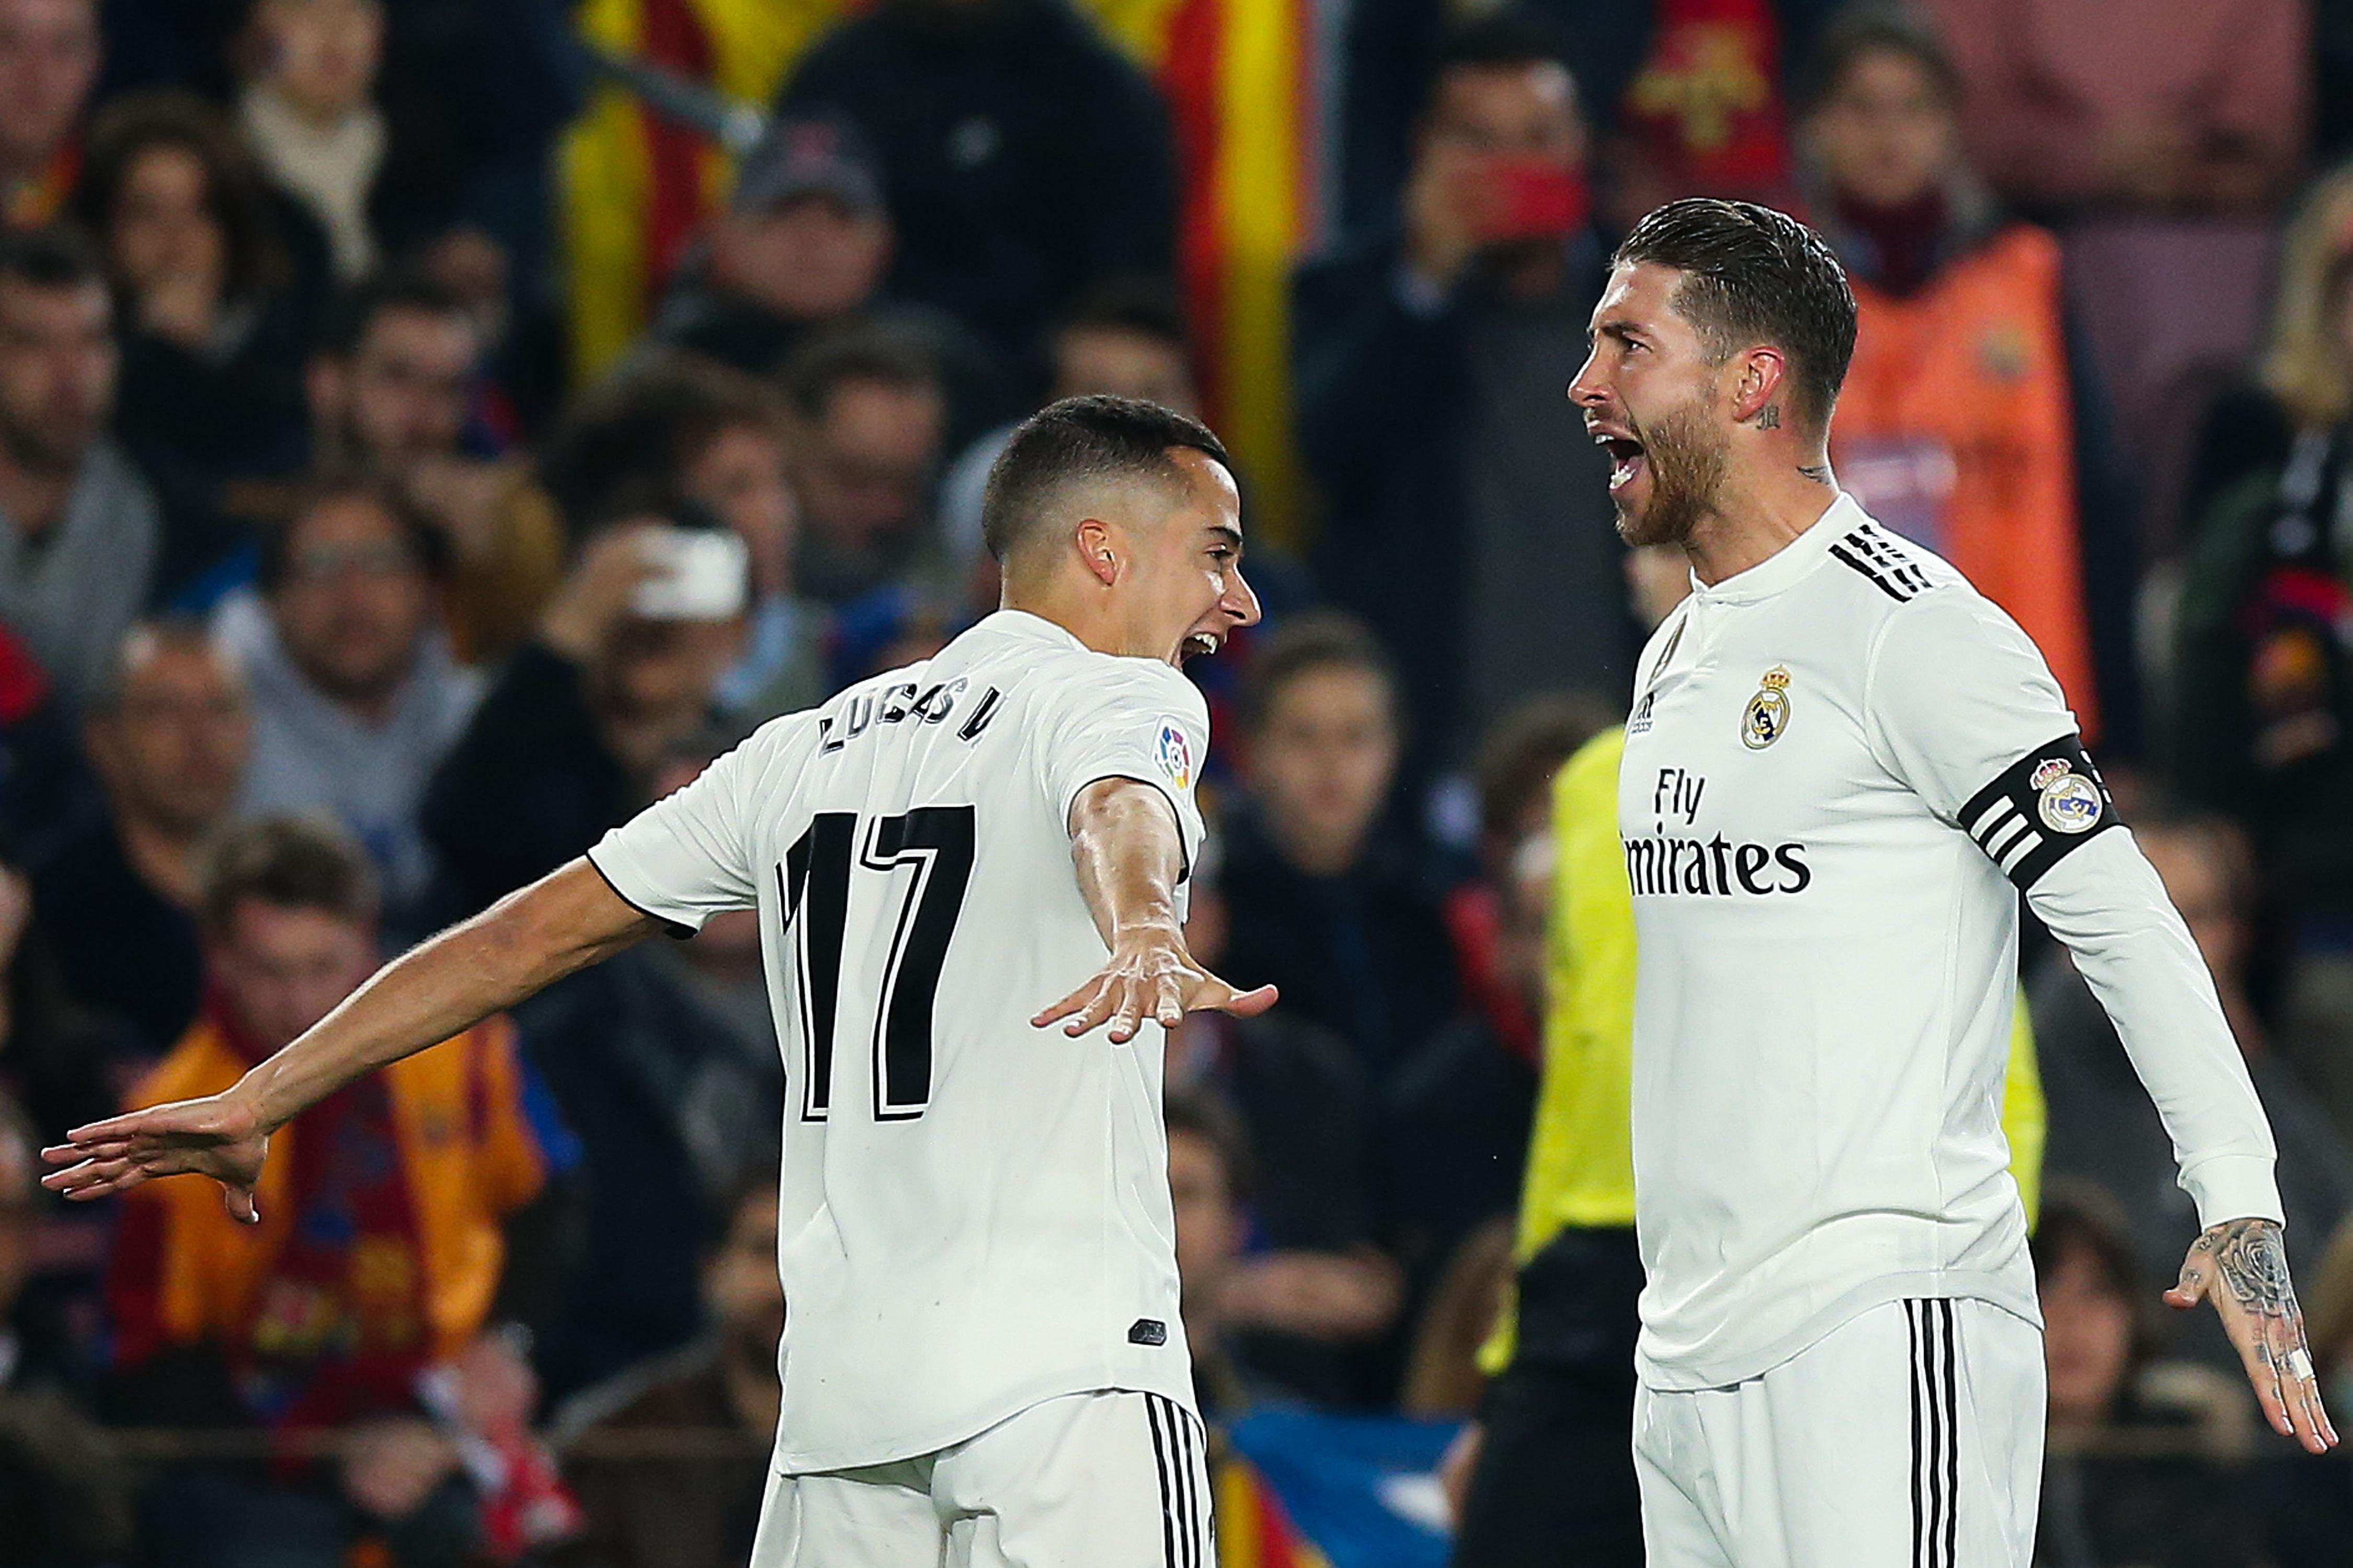 33c184f13f3 Real Madrid s draw vs. Barcelona pushes El Clasico humiliation ...